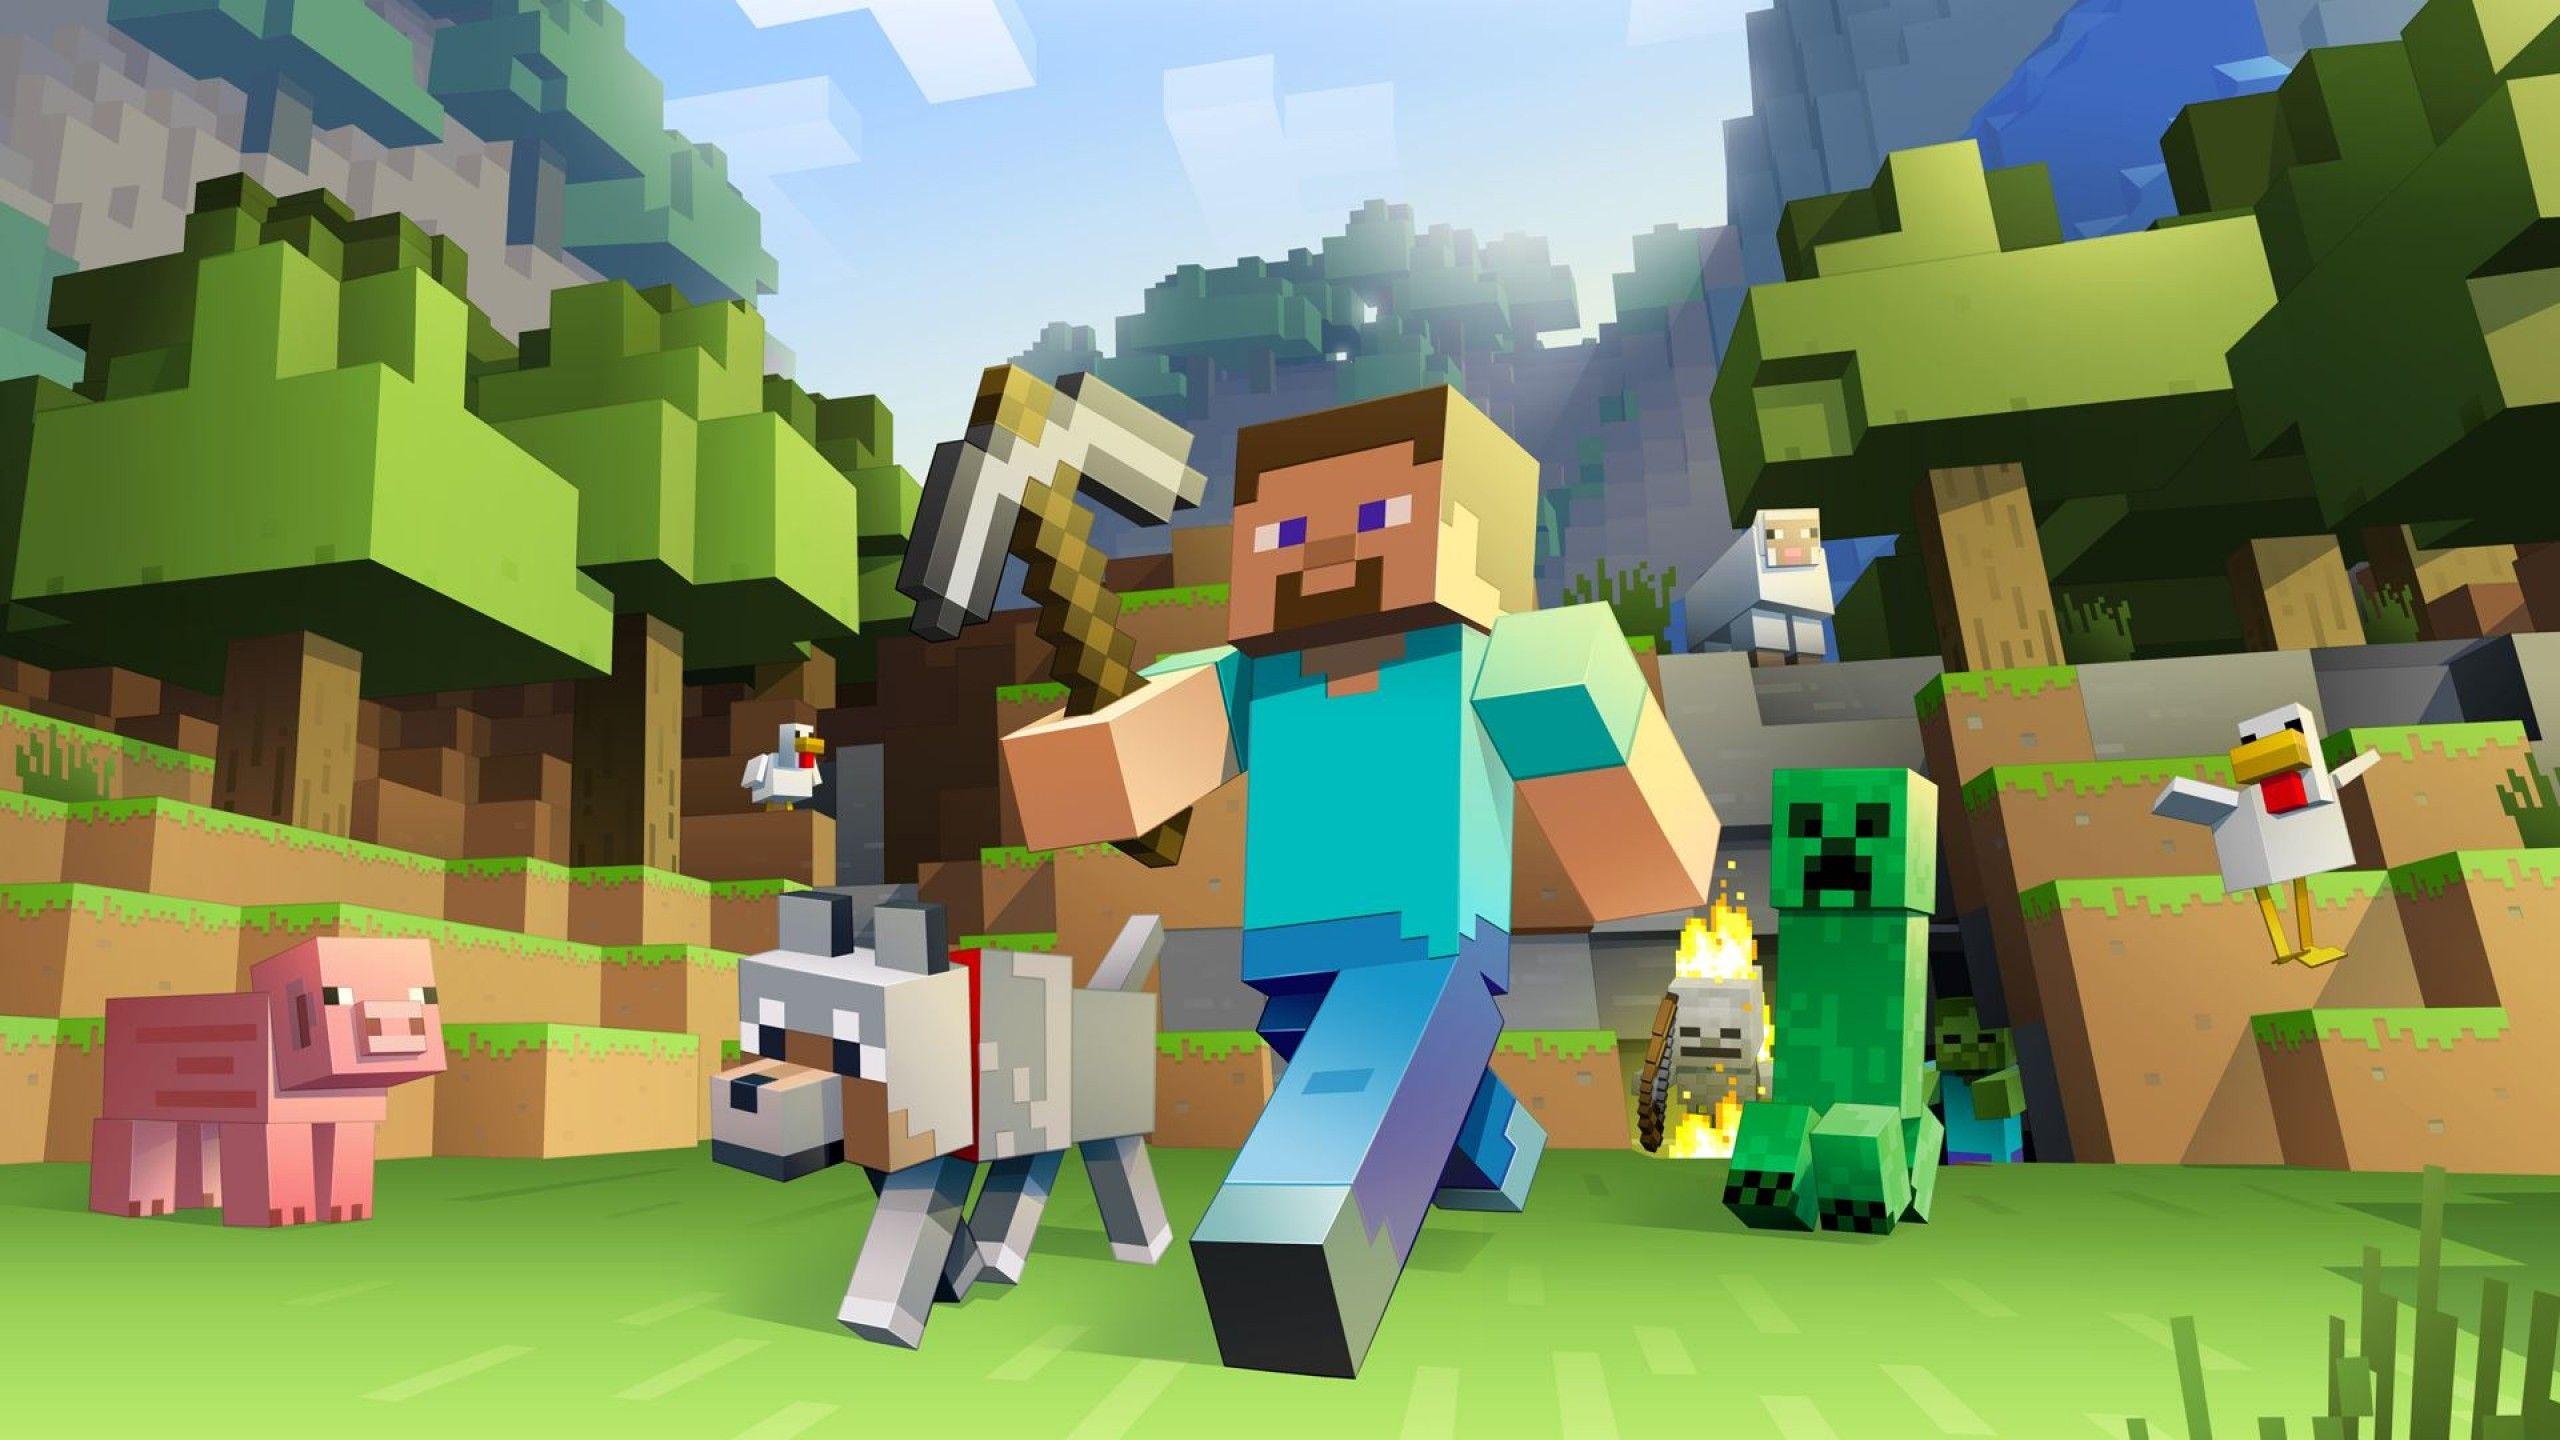 Similiar Minecraft X 1440 2560 Santi Derp KeywordsFiesta Face TwikXZOPu